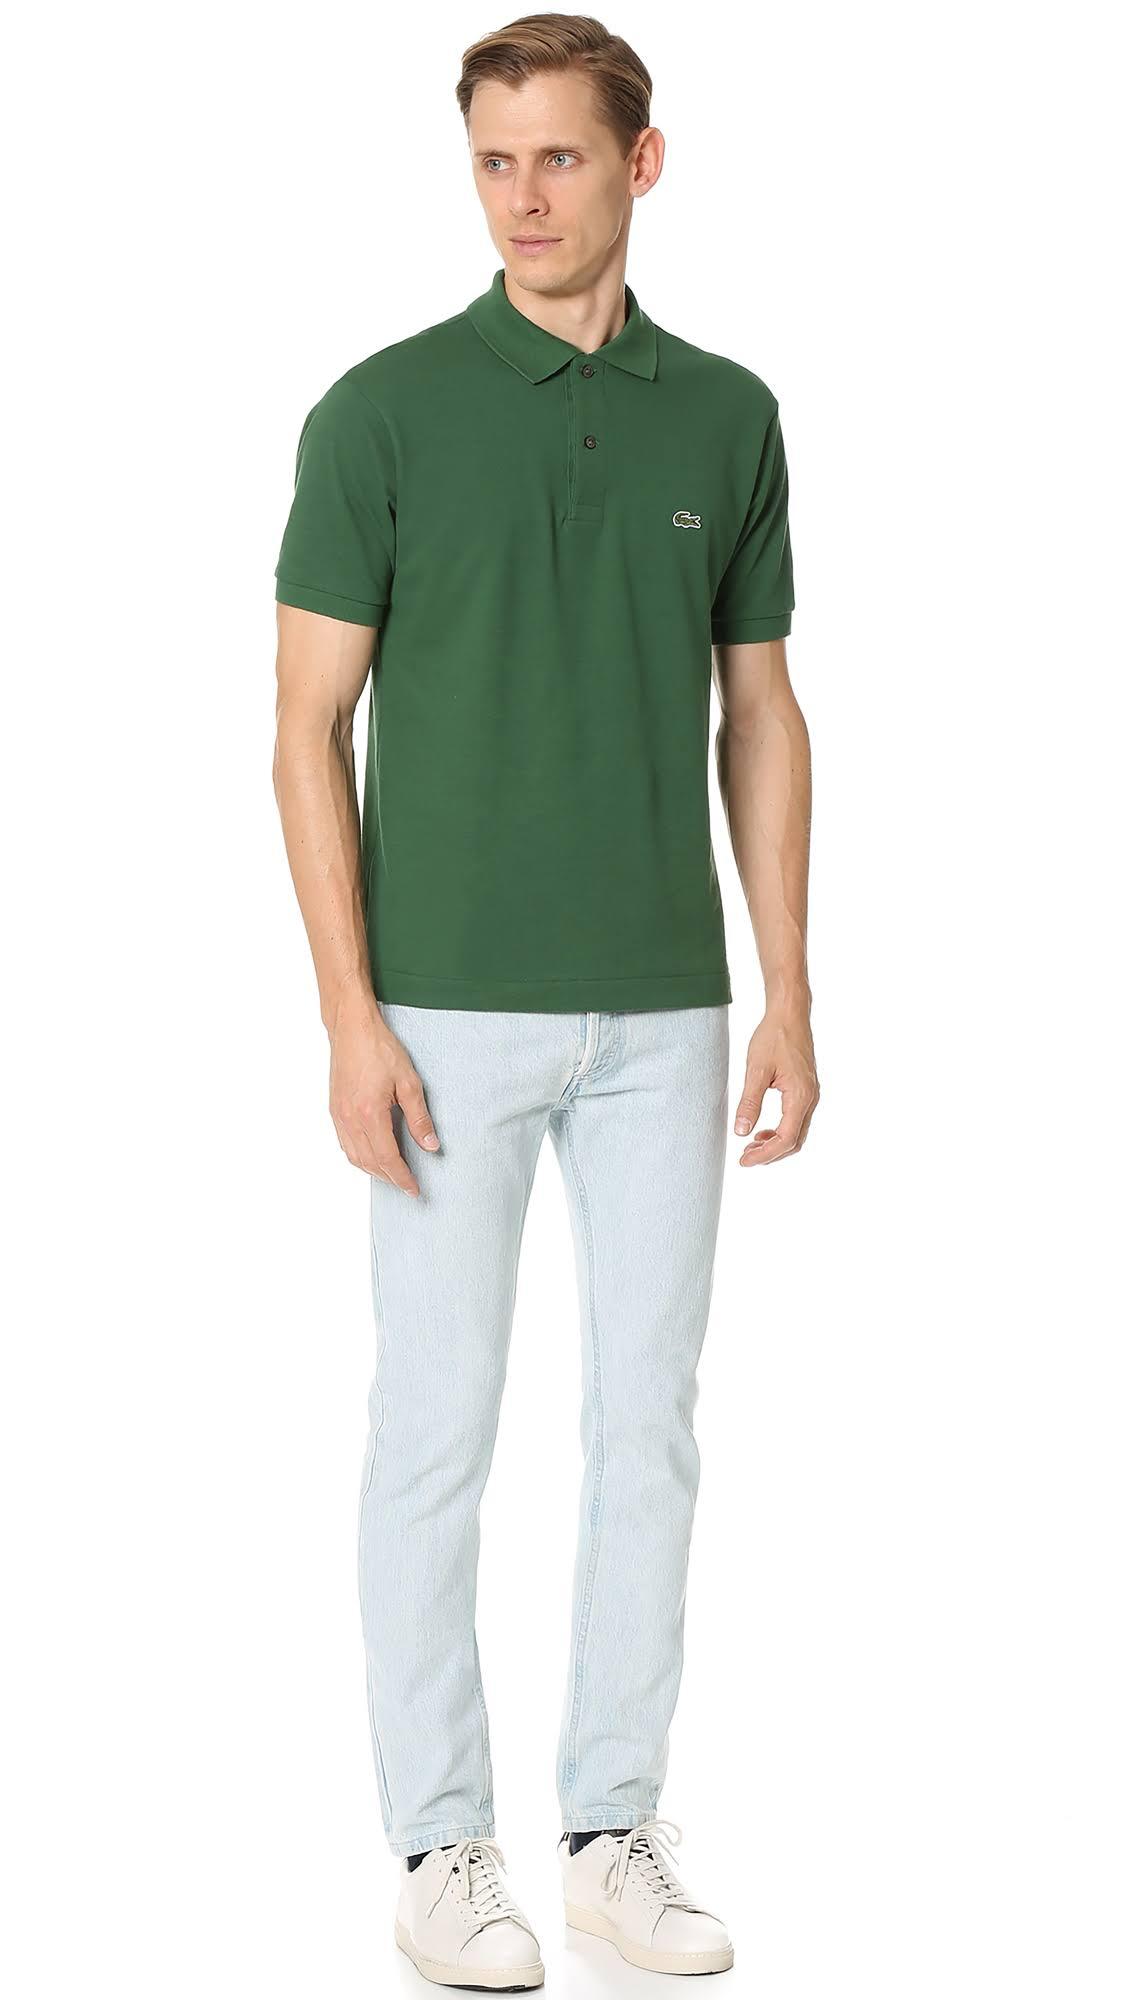 Lacoste Mens 12 Green L Polo Style L Shirt 132 Piqué ធម្មតា 12 rfxZp